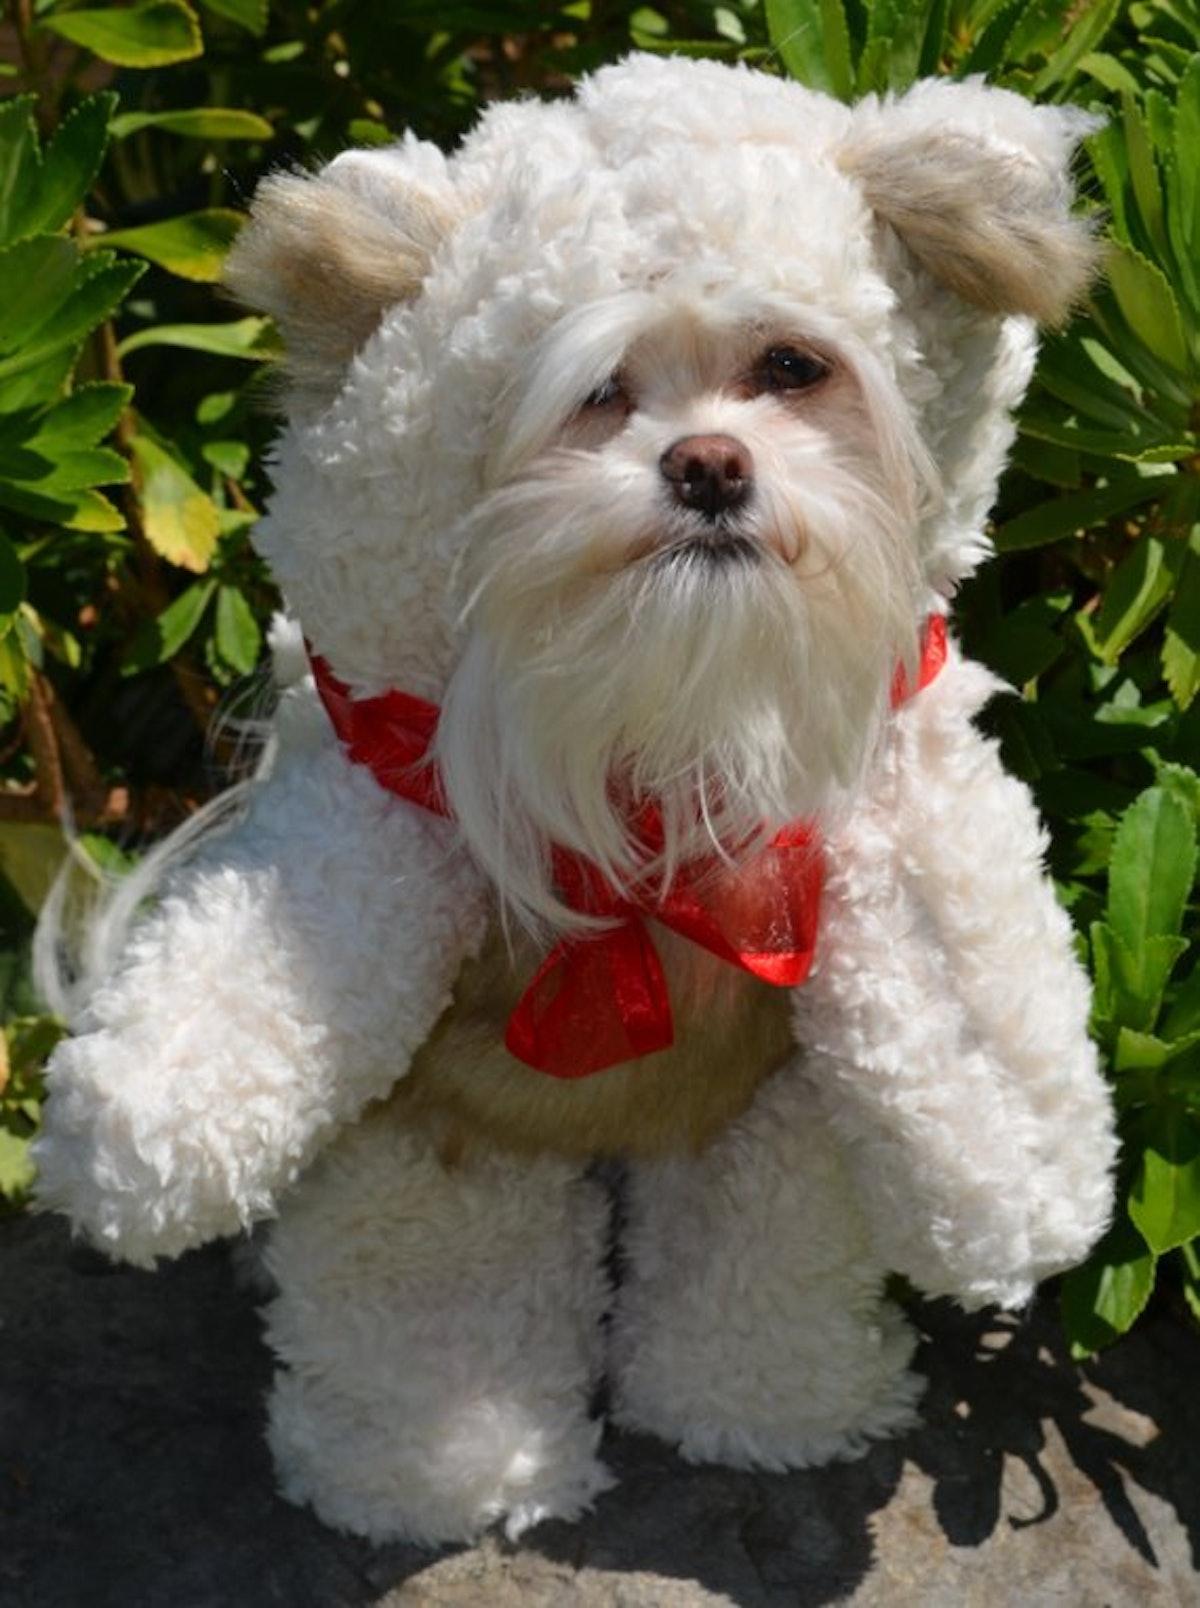 Soft Cream colored Teddy Bear (Looks Like It Is Walking) Dog Costume